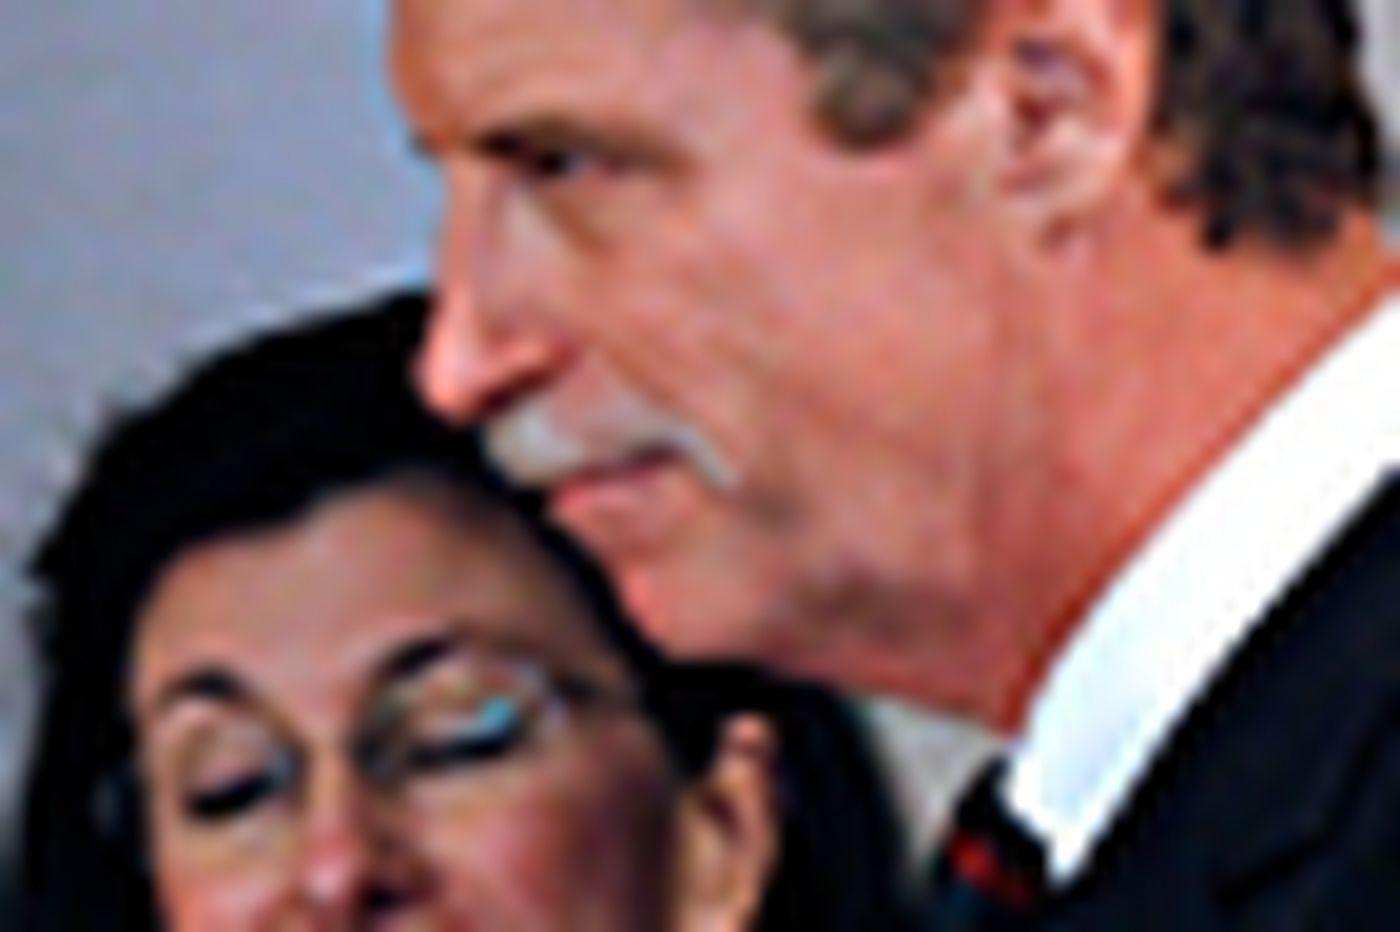 Federal attorney in La. resigns